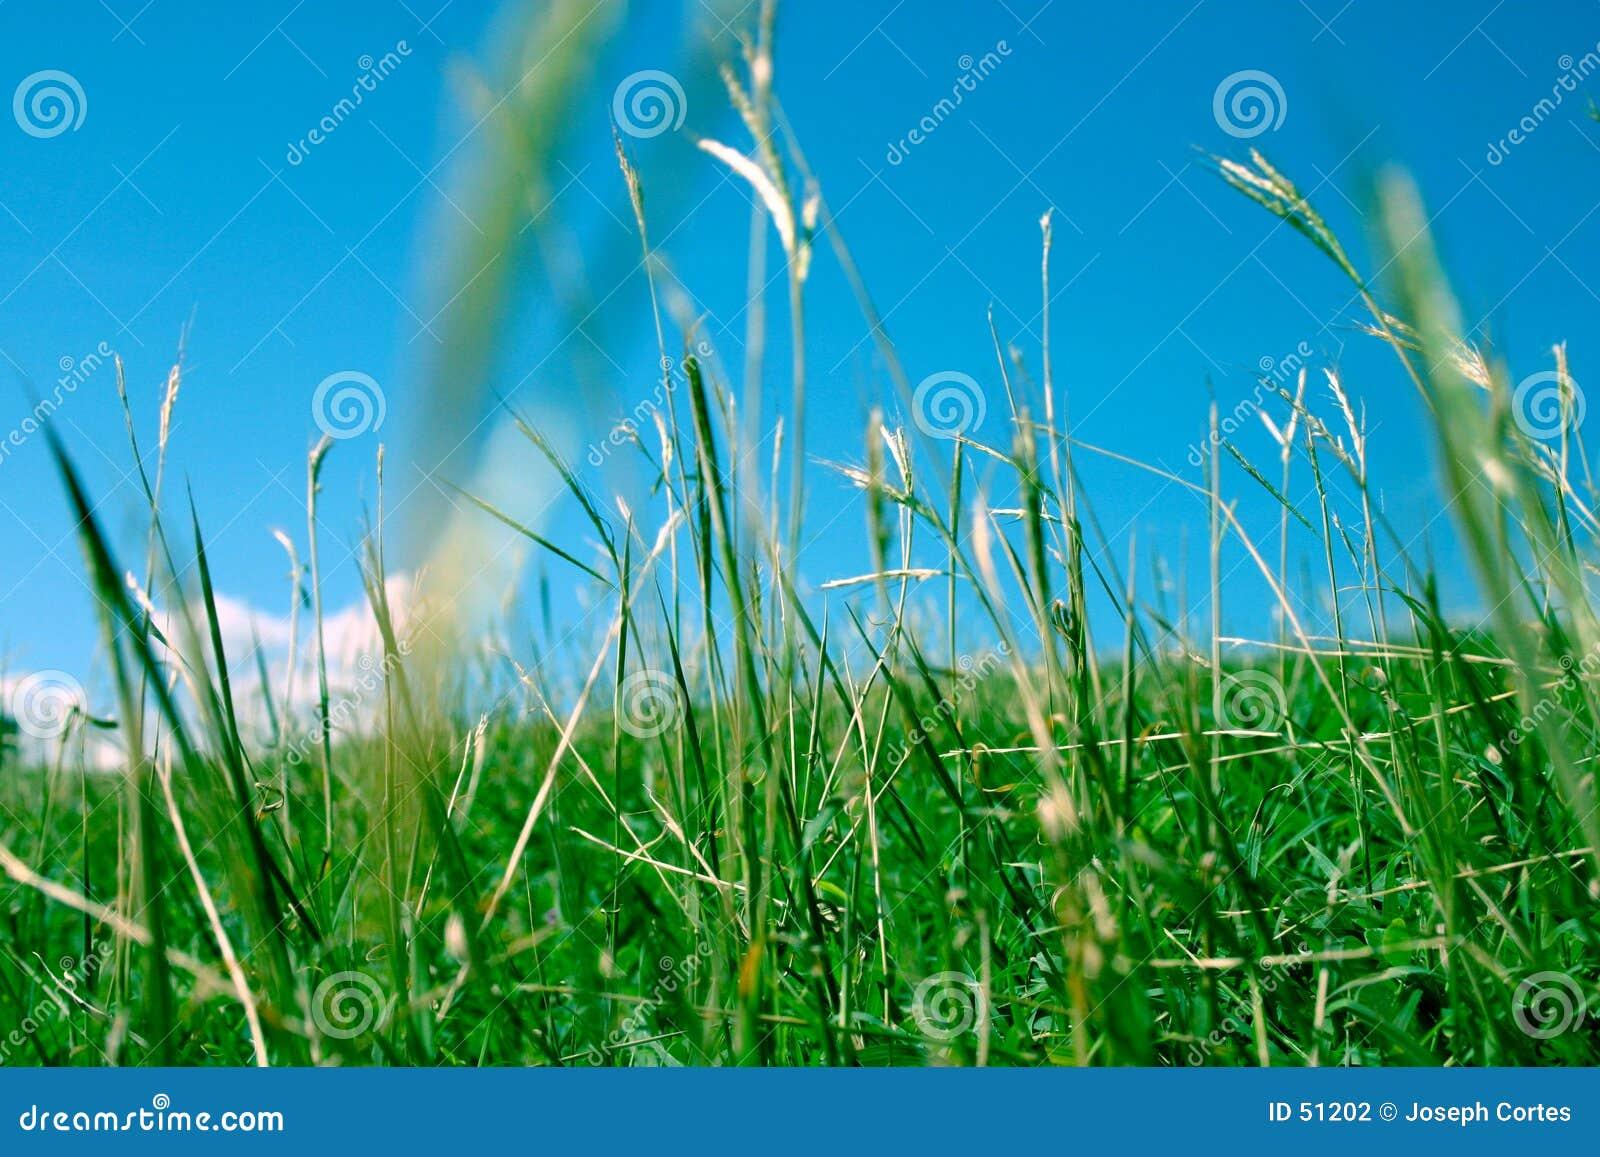 Download χλόη 2 πράσινη στοκ εικόνες. εικόνα από αγγλικά, λόφος, χώρα - 51202